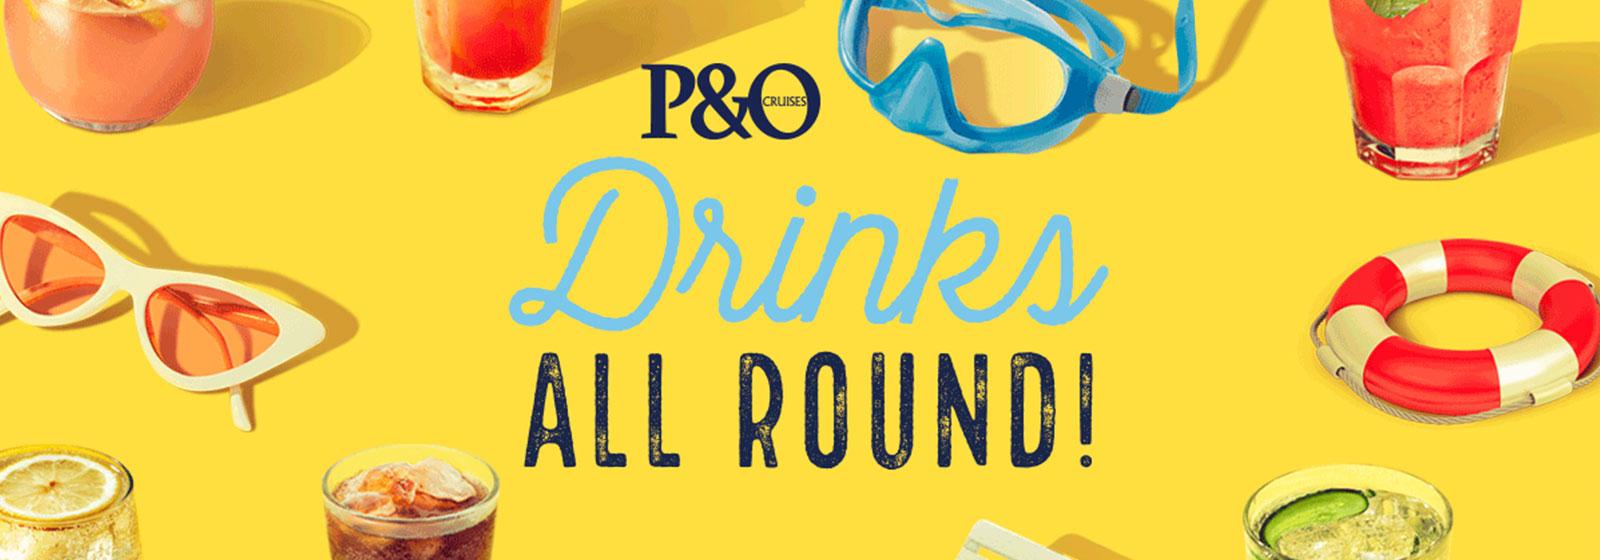 pno-drinks-all-round